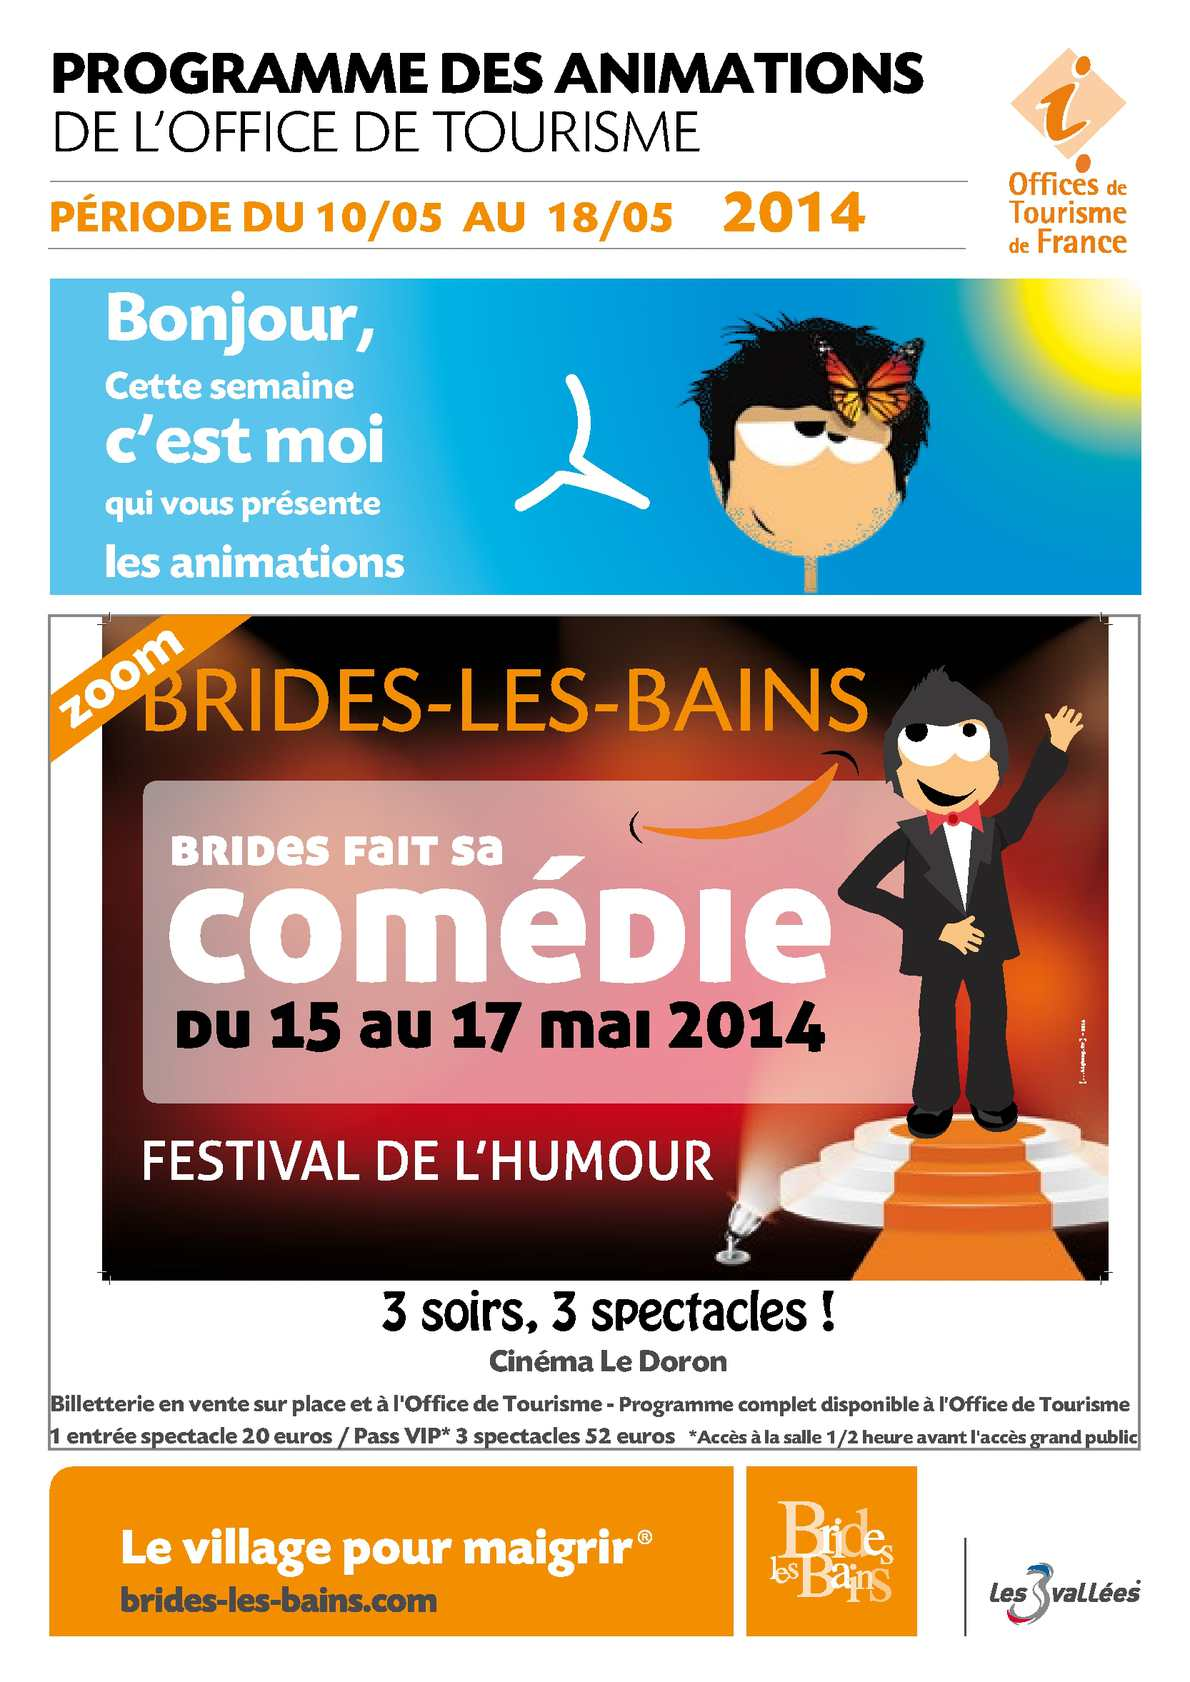 Calam o du 10 au 18 mai 2014 - Office de tourisme de brides les bains ...